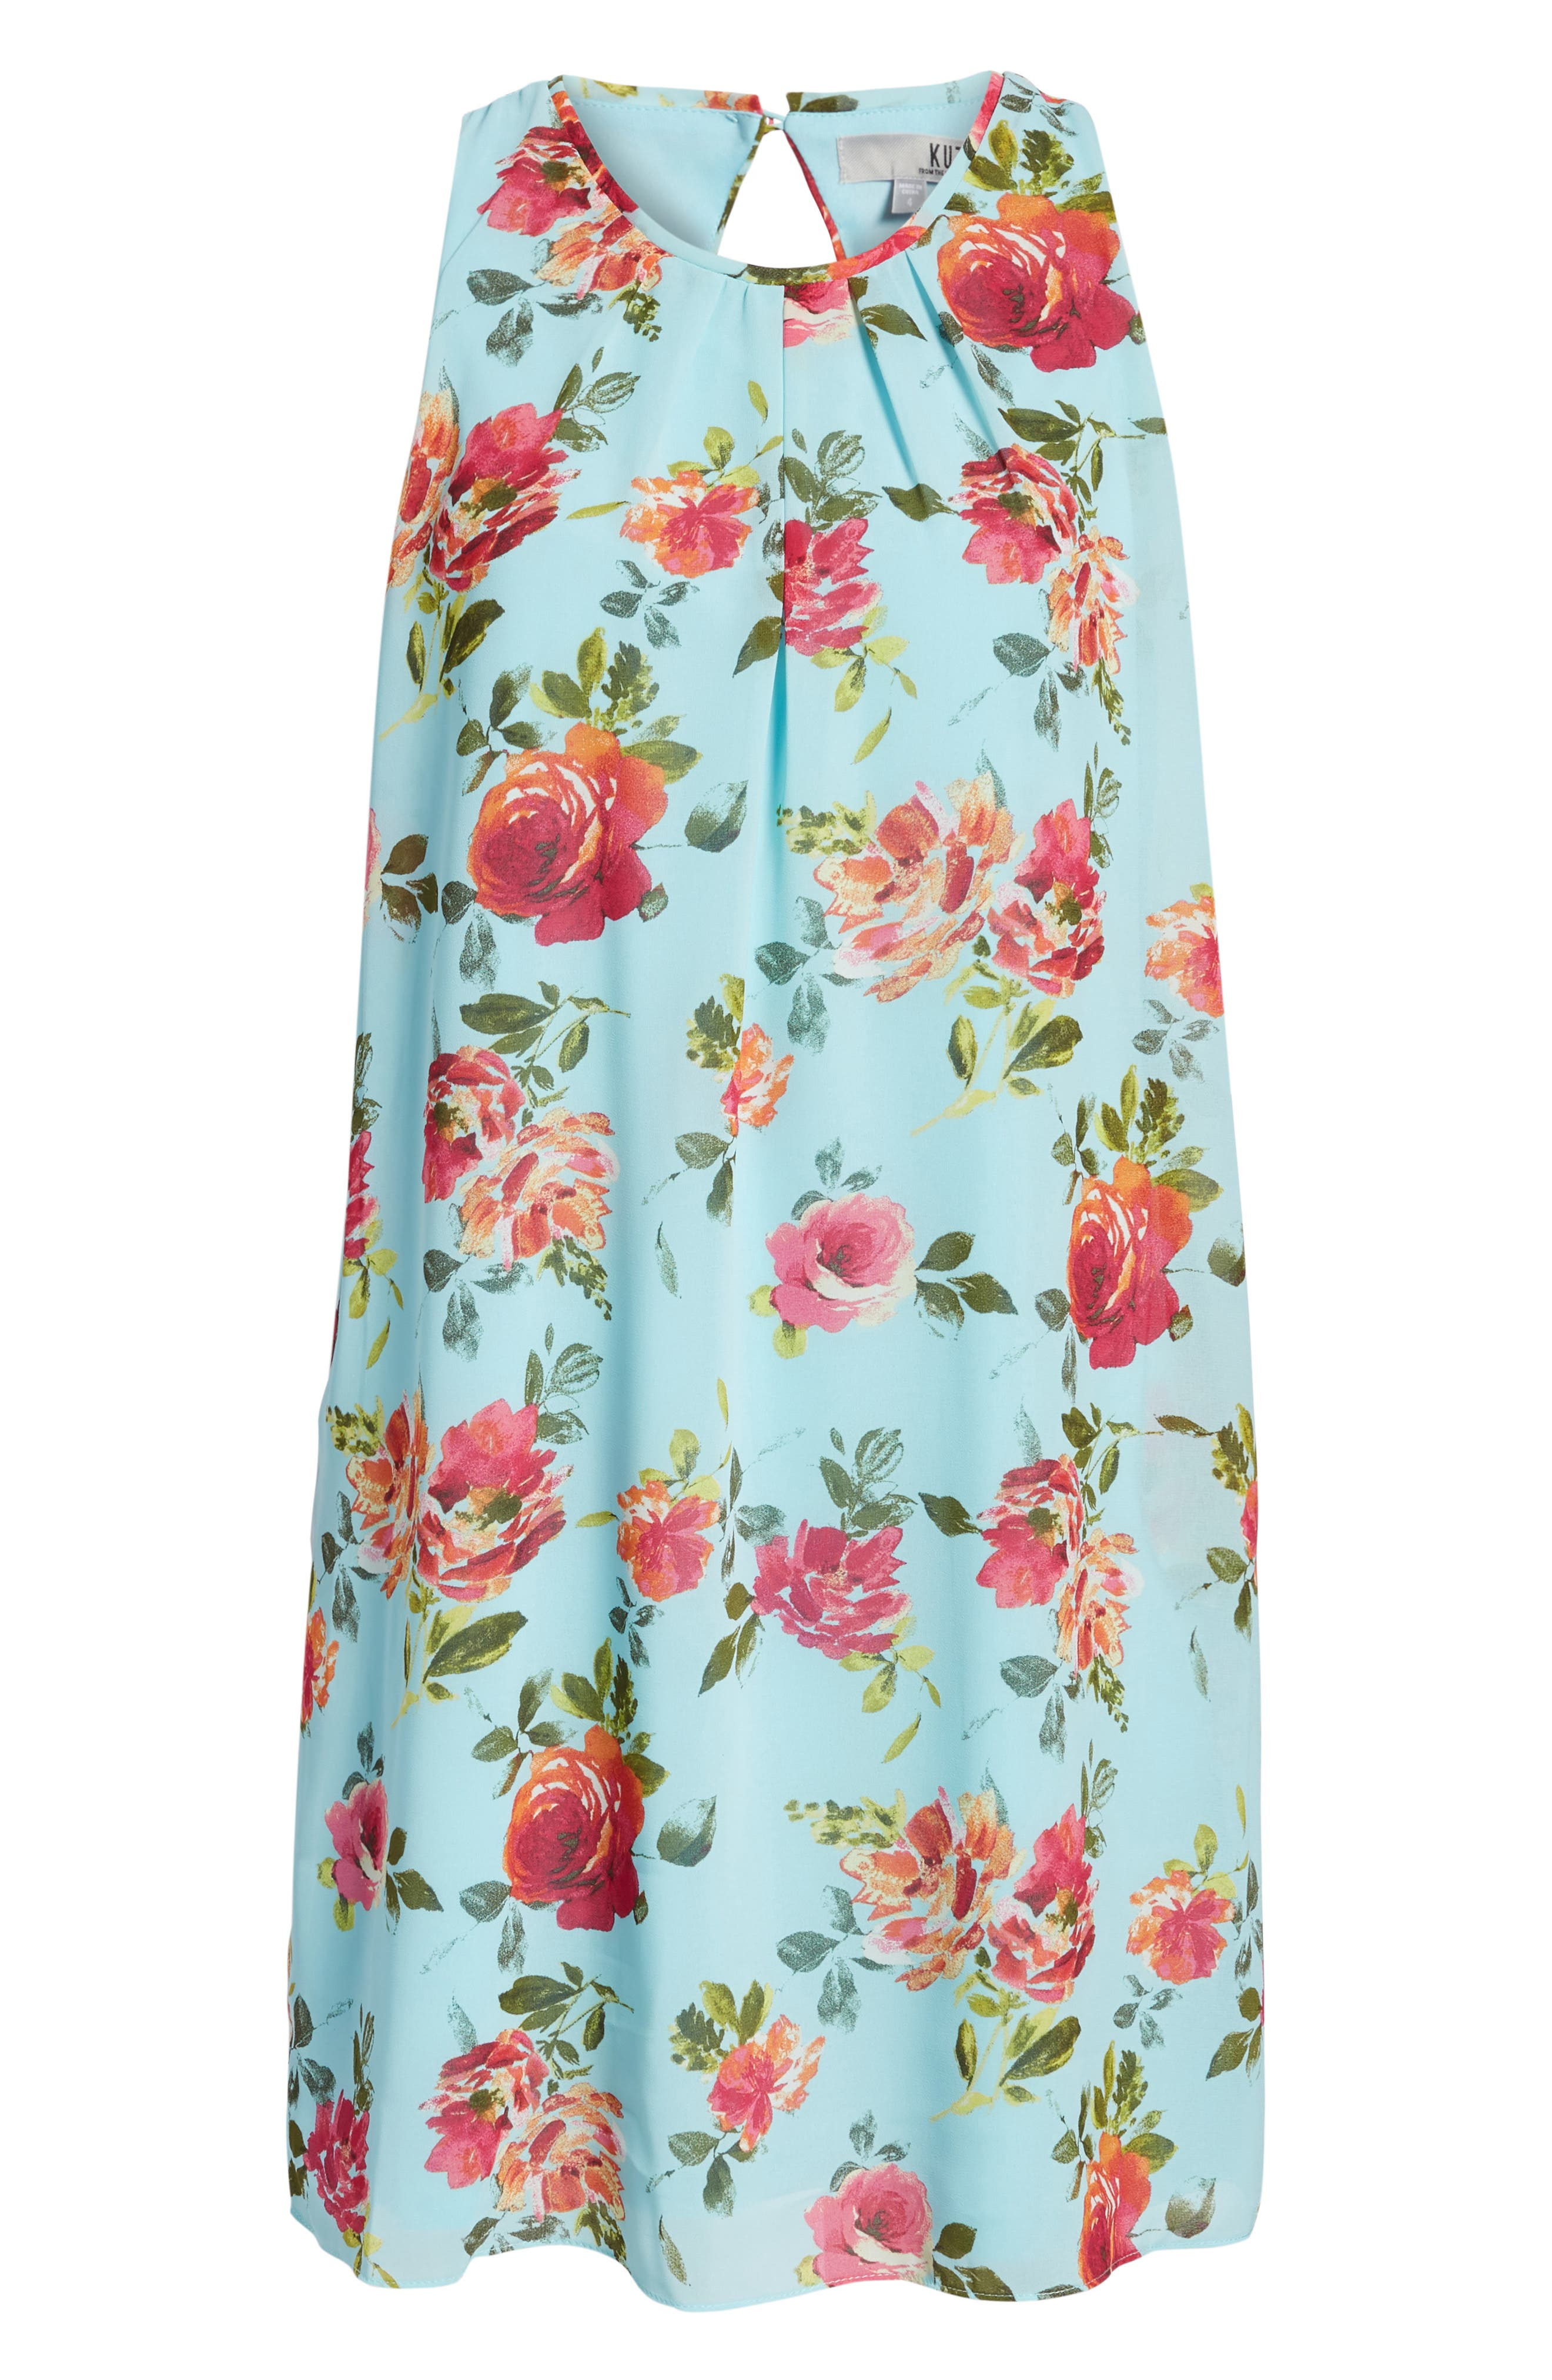 Sela Shift Floral Dress,                             Alternate thumbnail 6, color,                             Sky Blue